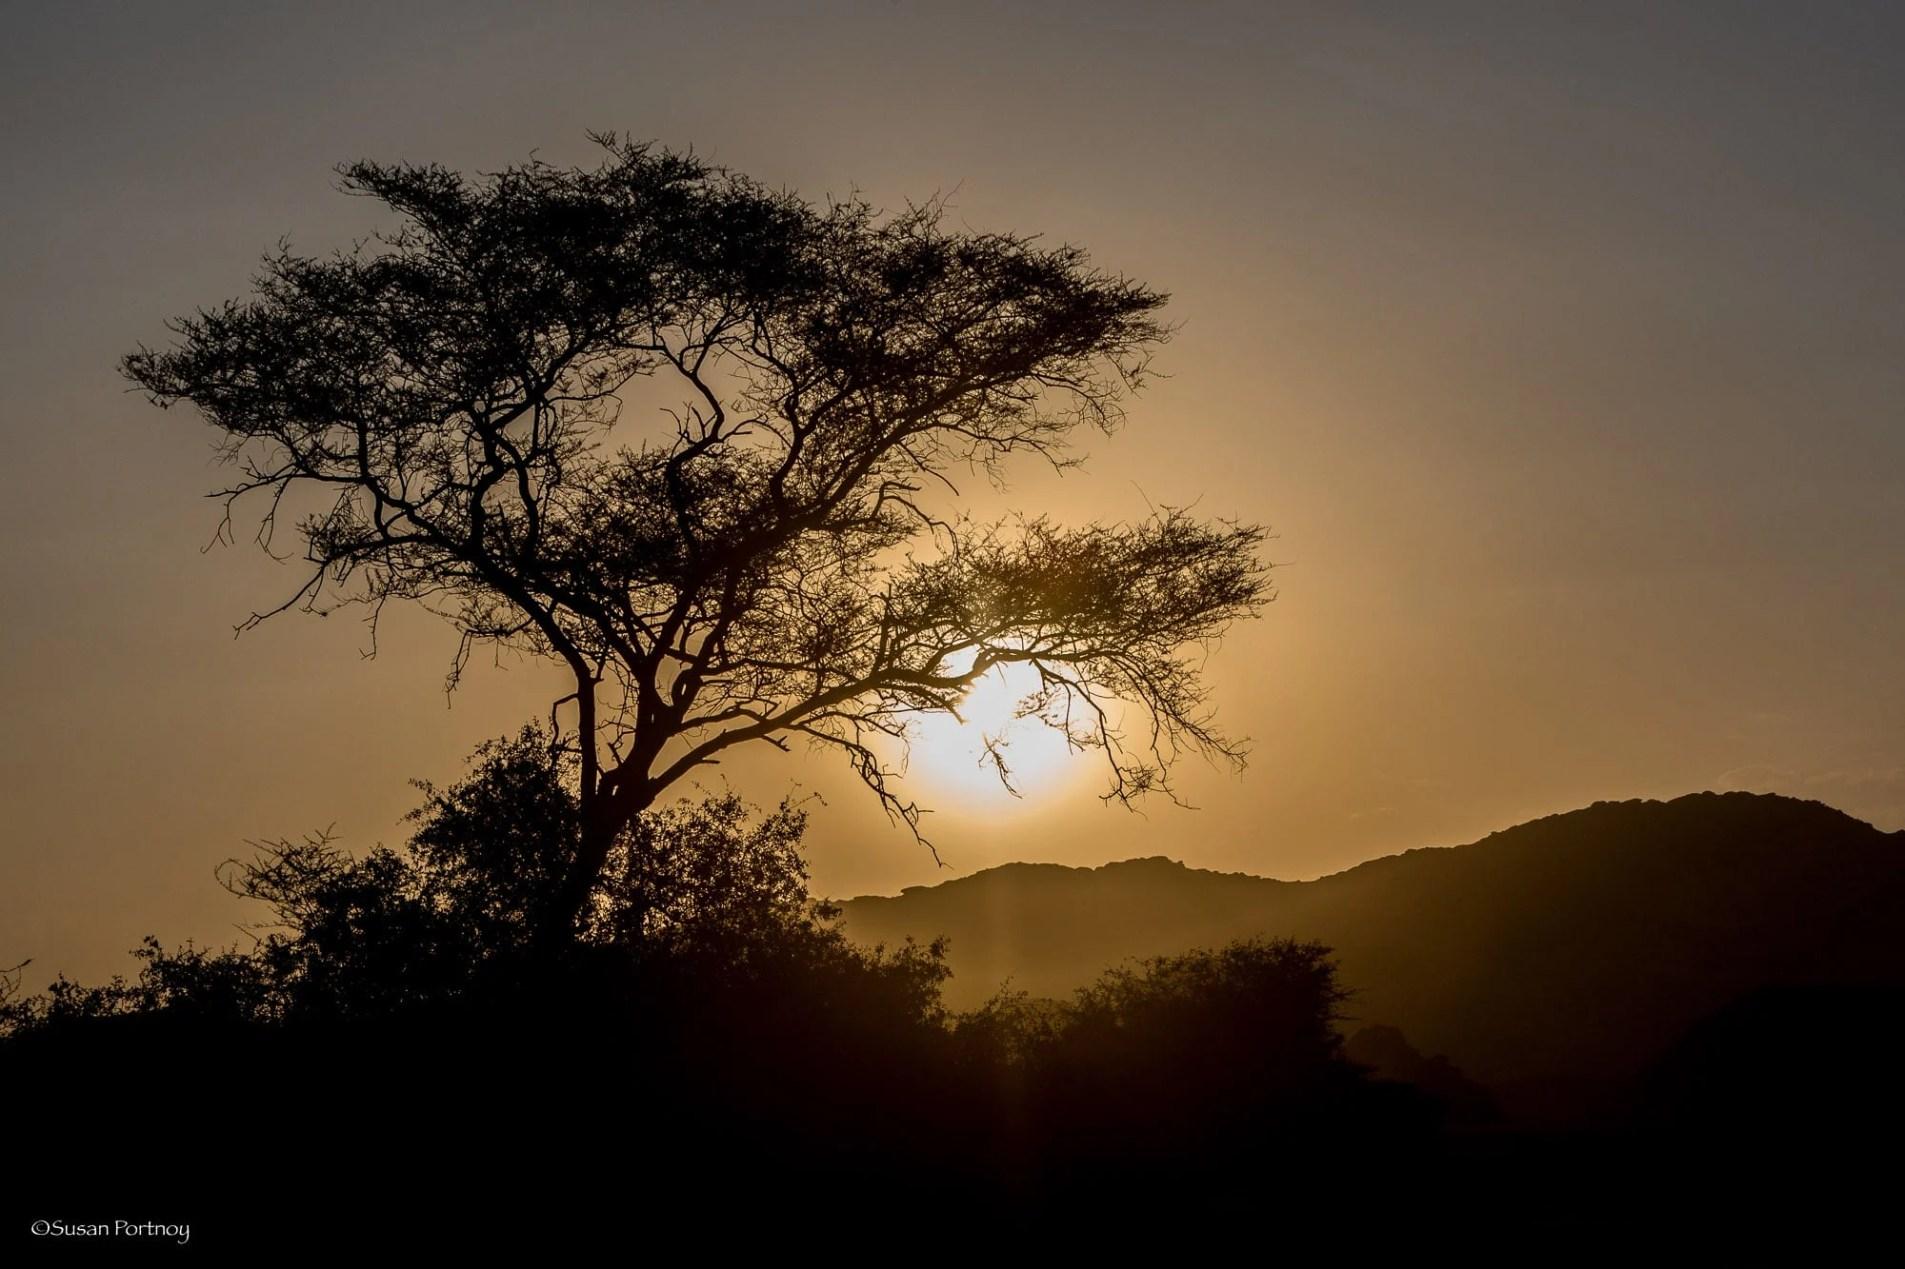 Sunset near Hoanib Skeleton Coast Camp in Namibia